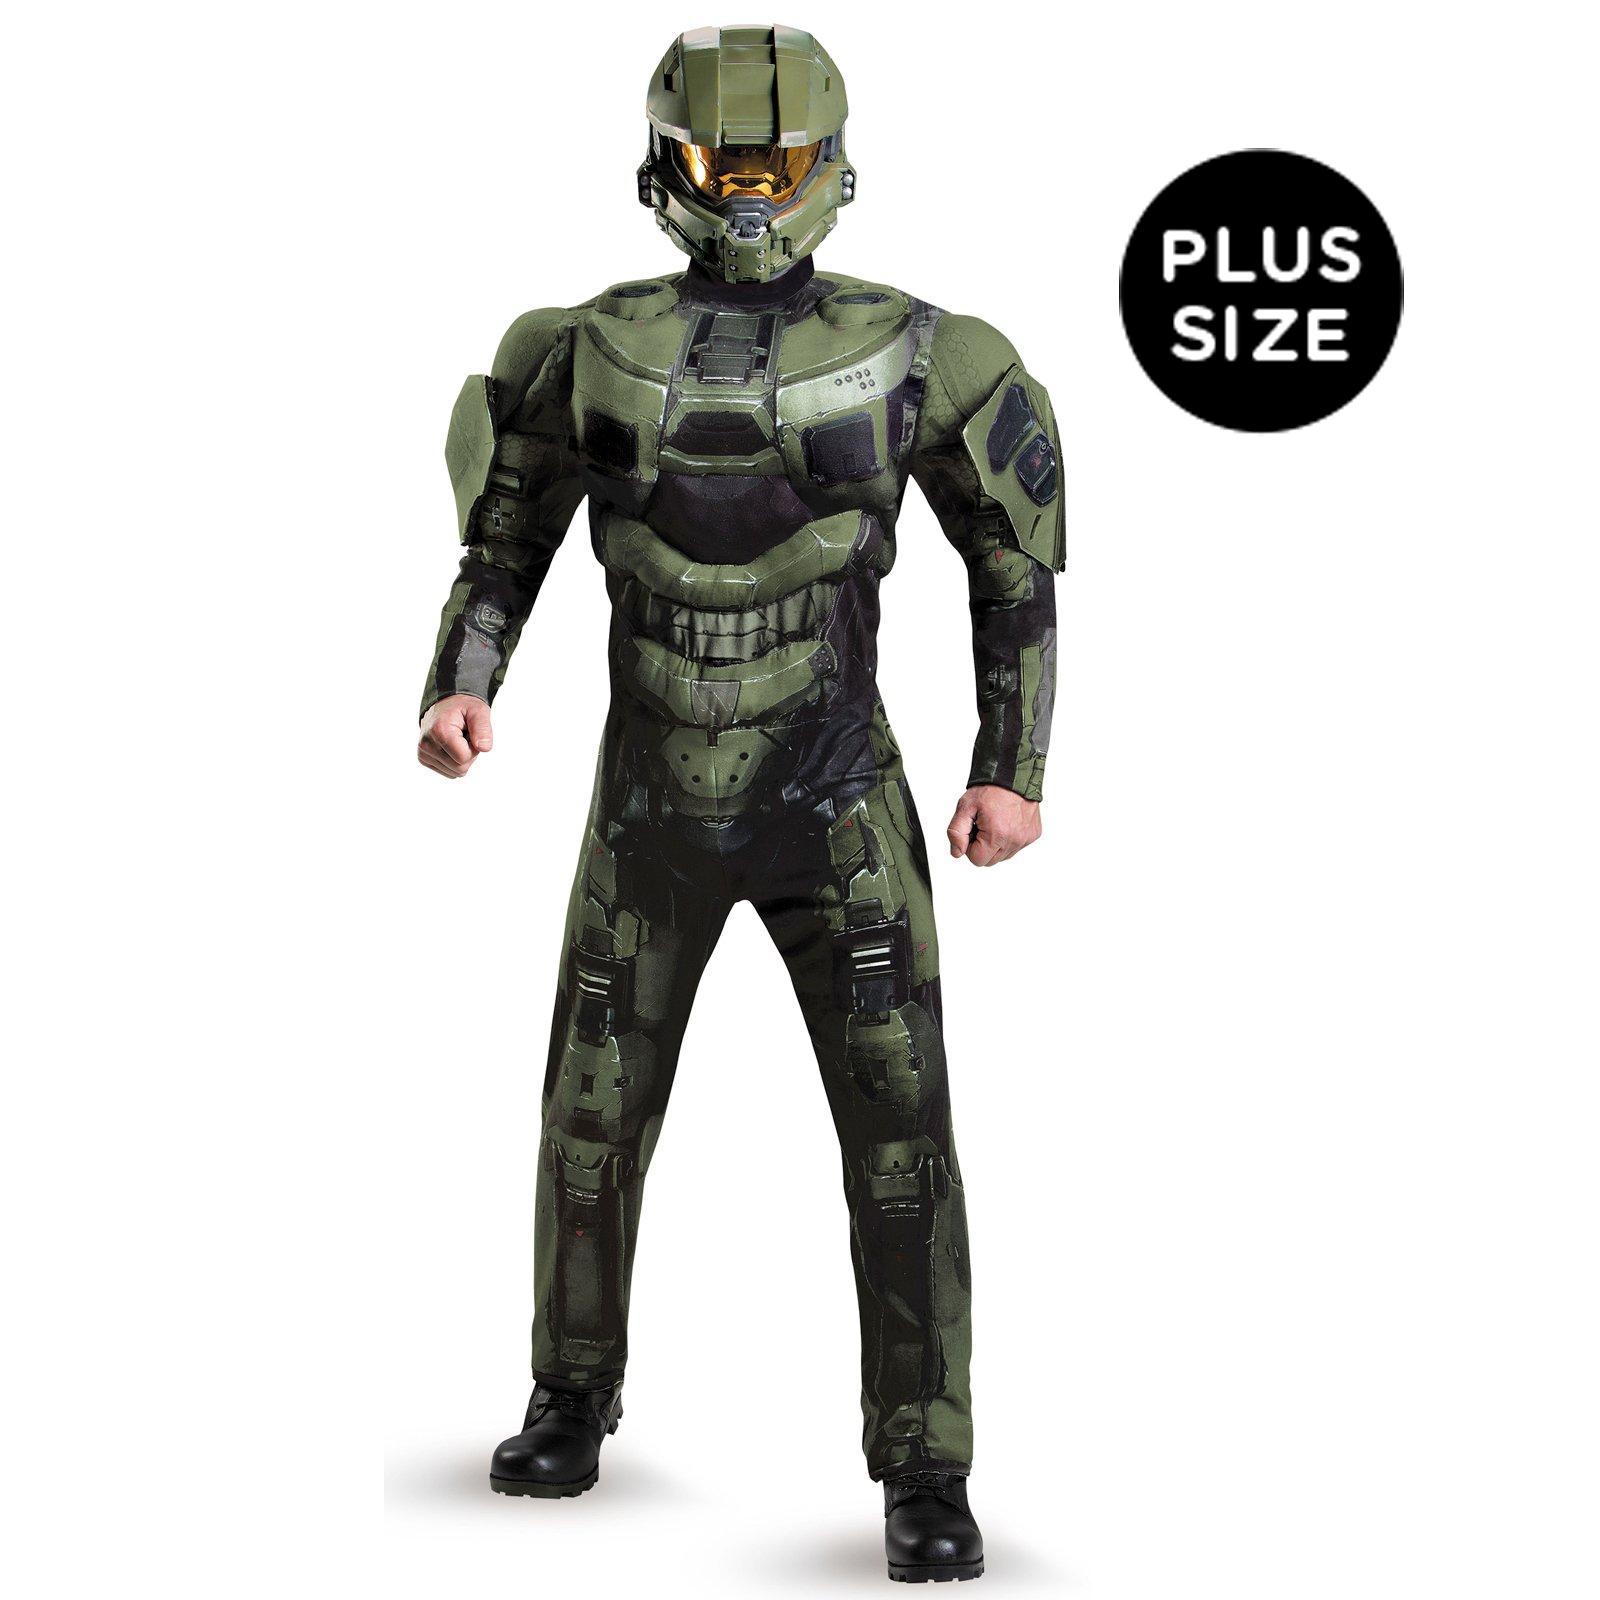 plus size detective costumes for women shop now